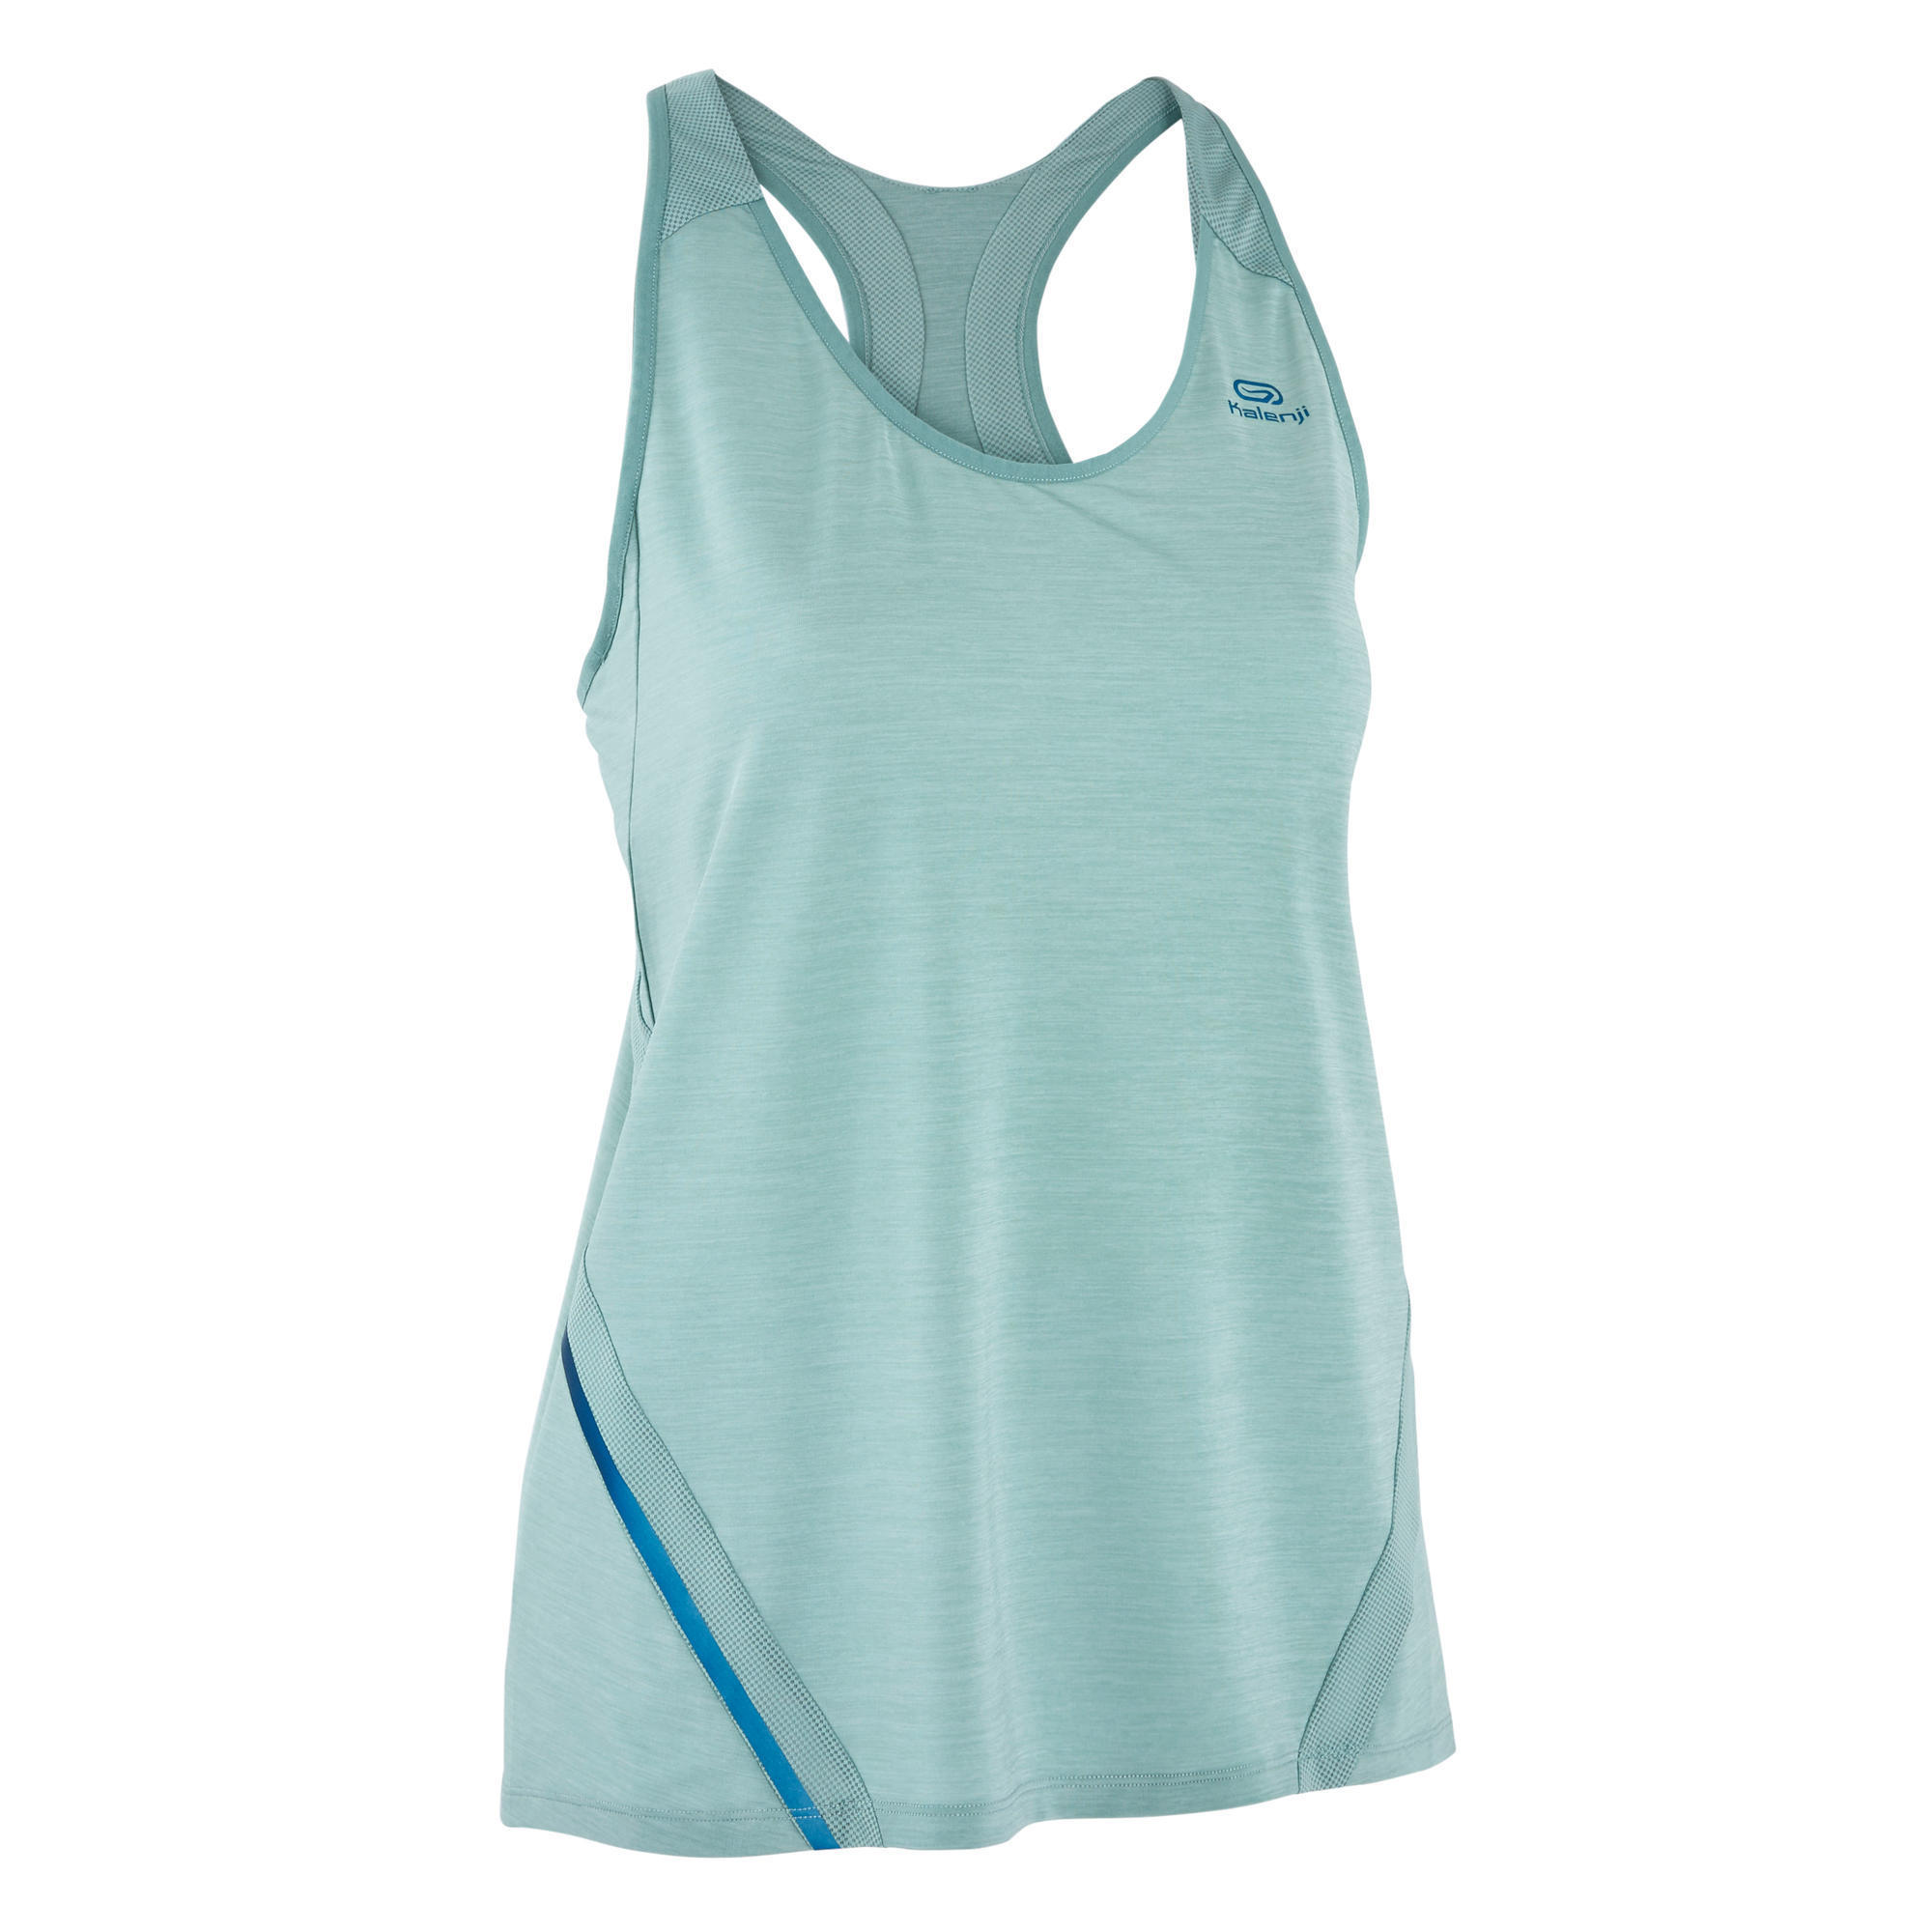 Lauftop Run Light Damen | Sportbekleidung > Sporttops | Kalenji